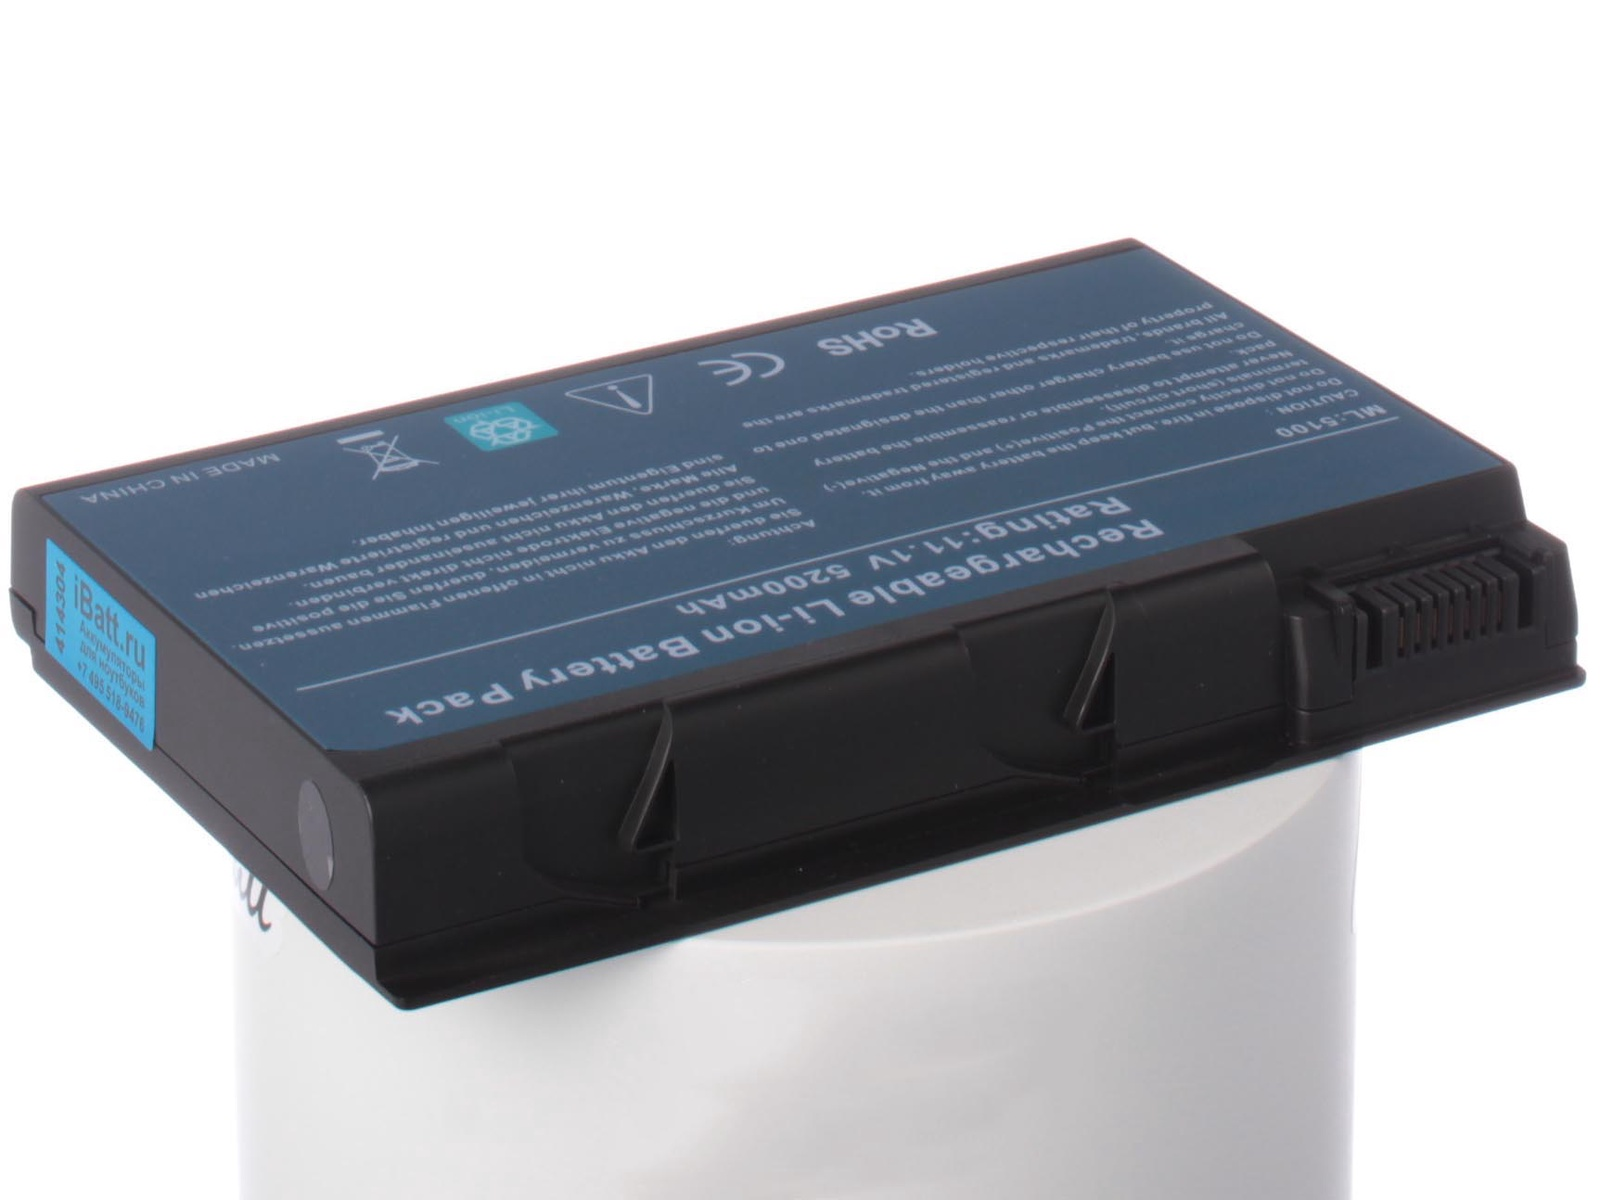 Аккумулятор для ноутбука iBatt для Acer Aspire 5632WLMi, TravelMate 2492, TravelMate 2493, Aspire 5633, TravelMate 2451WLMi, Aspire 5113, Aspire 9805WKHi, TravelMate 4233, Aspire 3651WLMi, Aspire 5612ZWLMi, TravelMate 2451 acer aspire switch 10